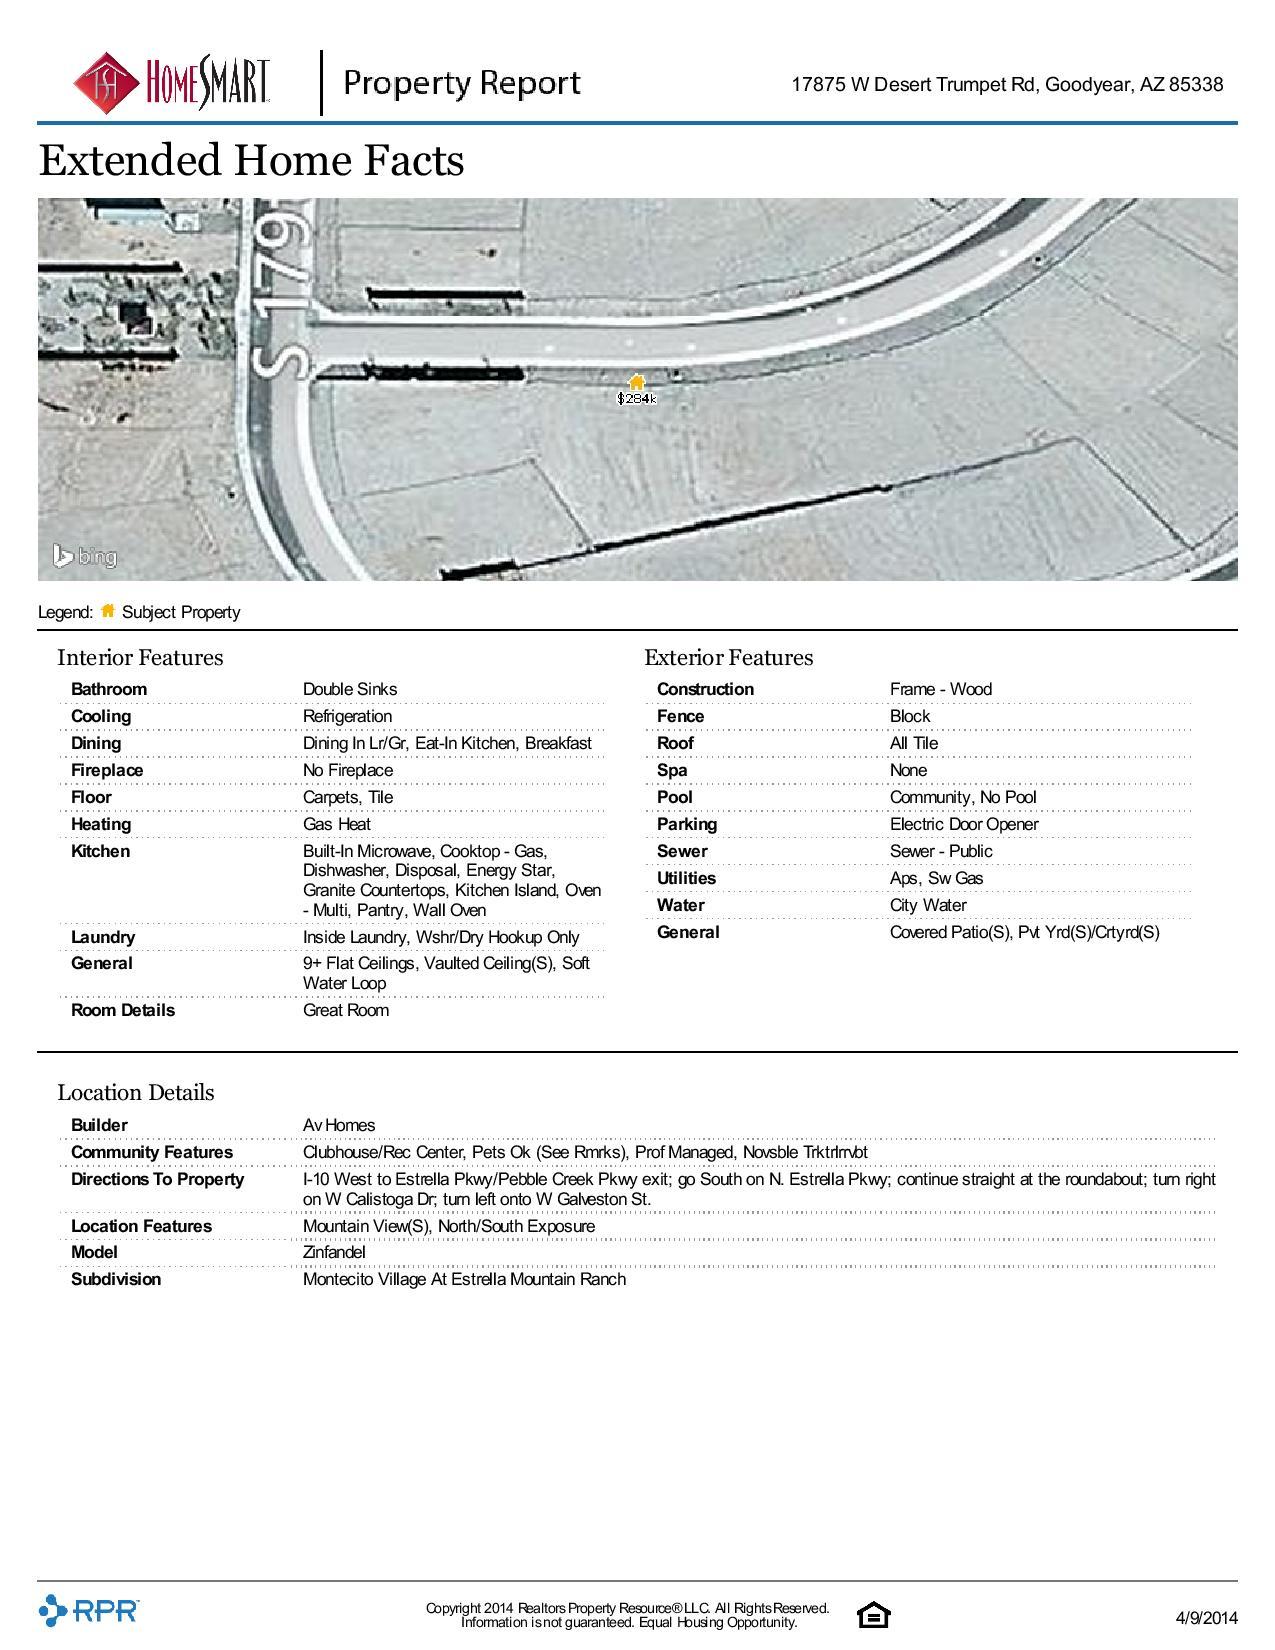 17875-W-Desert-Trumpet-Rd-Goodyear-AZ-85338-page-004